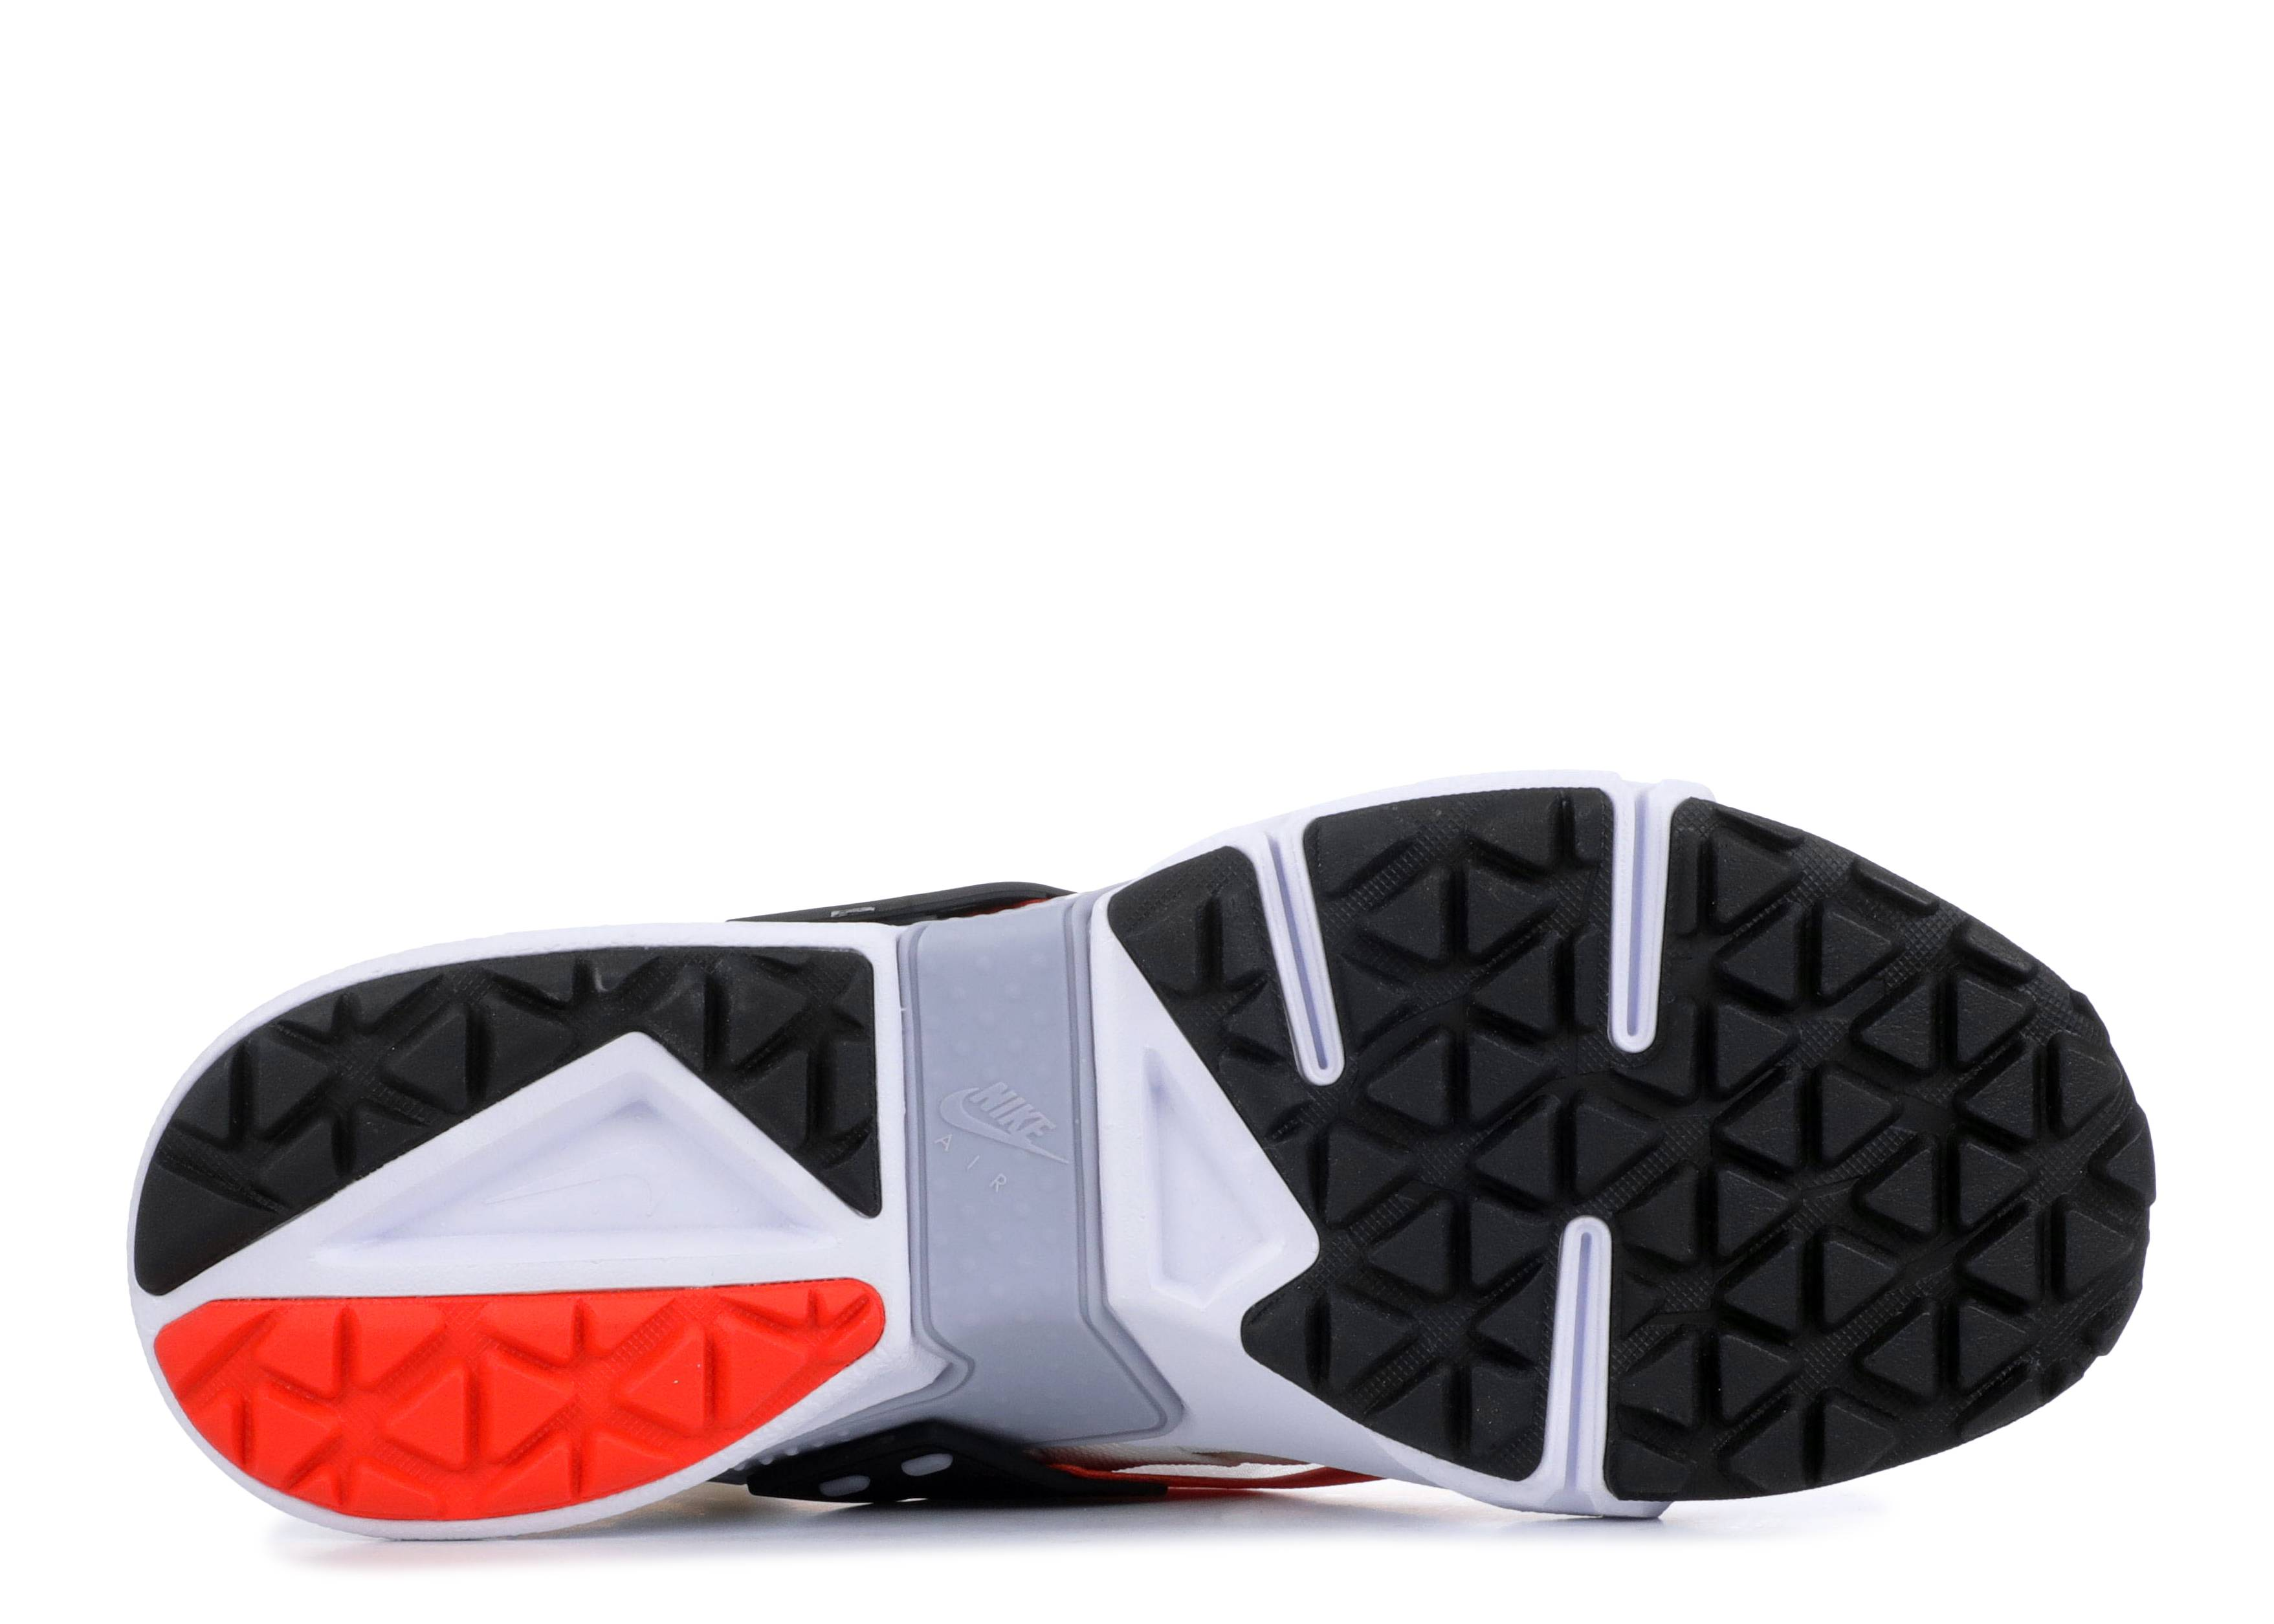 buy online 610fb f6672 Nike Air Huarache Gripp Qs - Nike - at0298 100 - sail orange white   Flight  Club